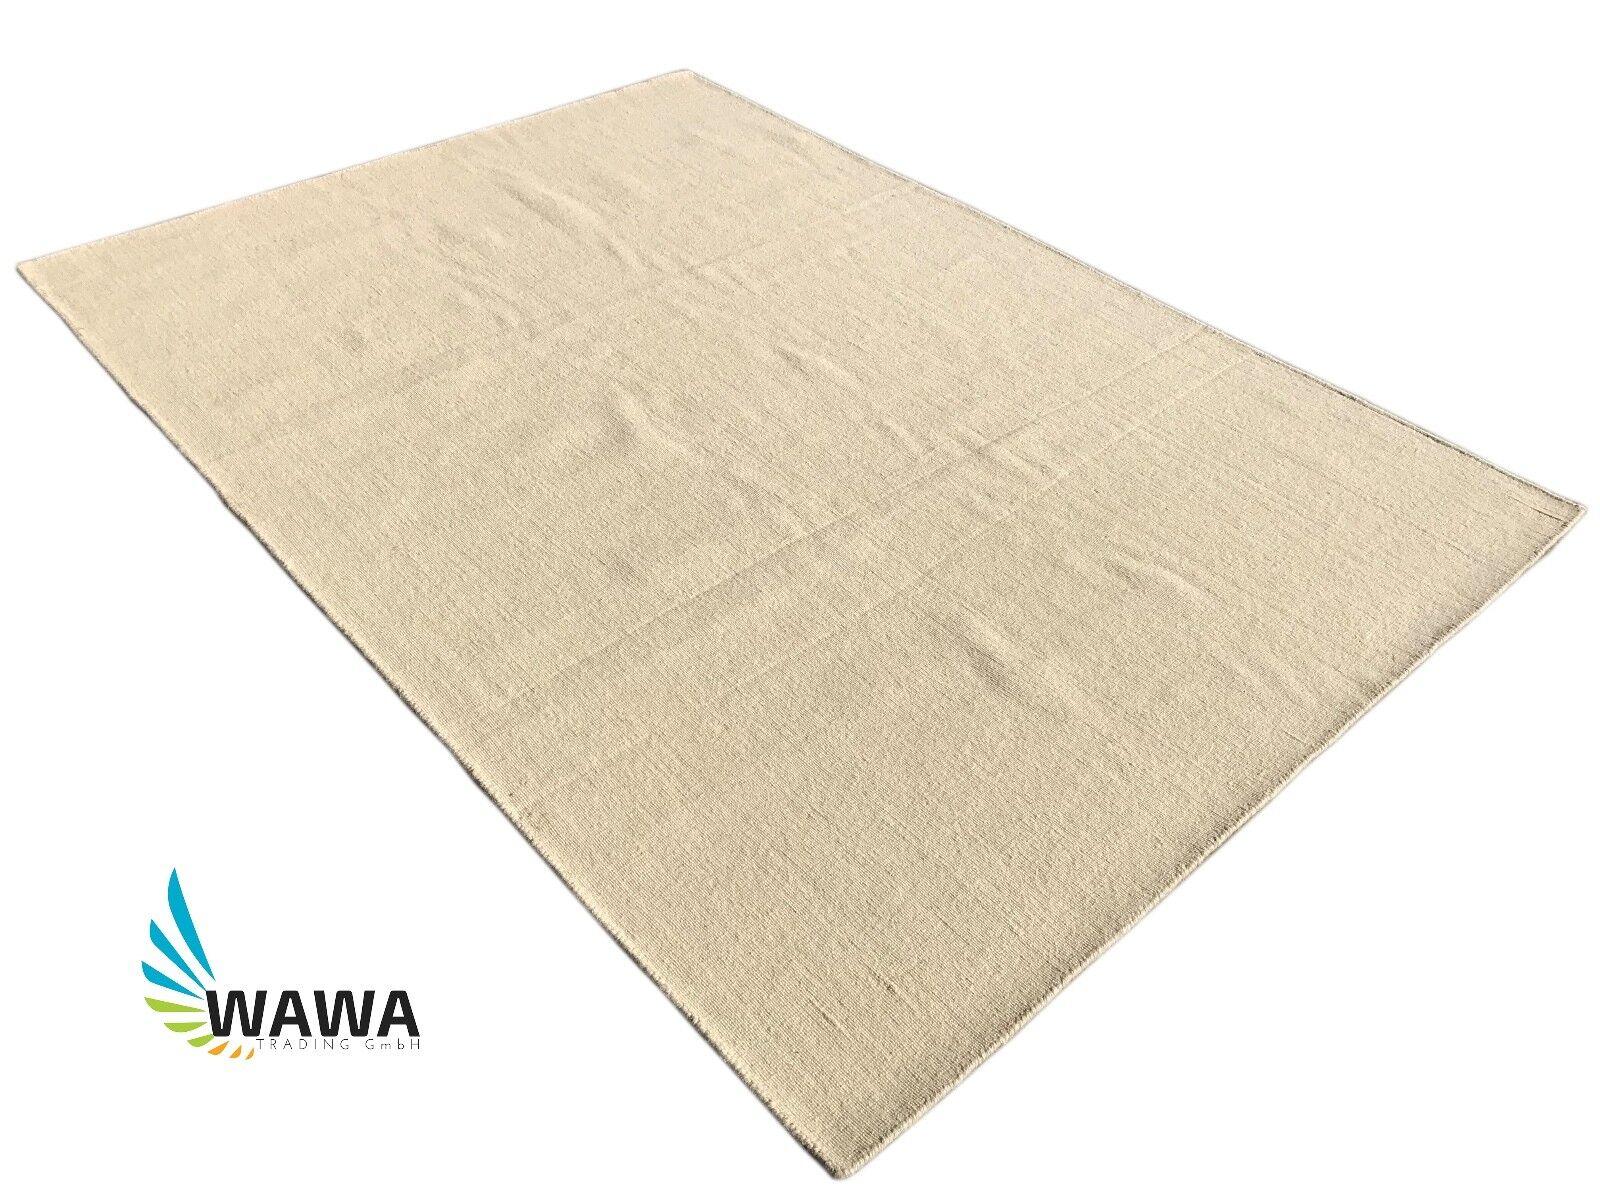 Kilim tejida lana Kilim 160x230 cm 100% lana tejida Loom Durrie beige b32b10